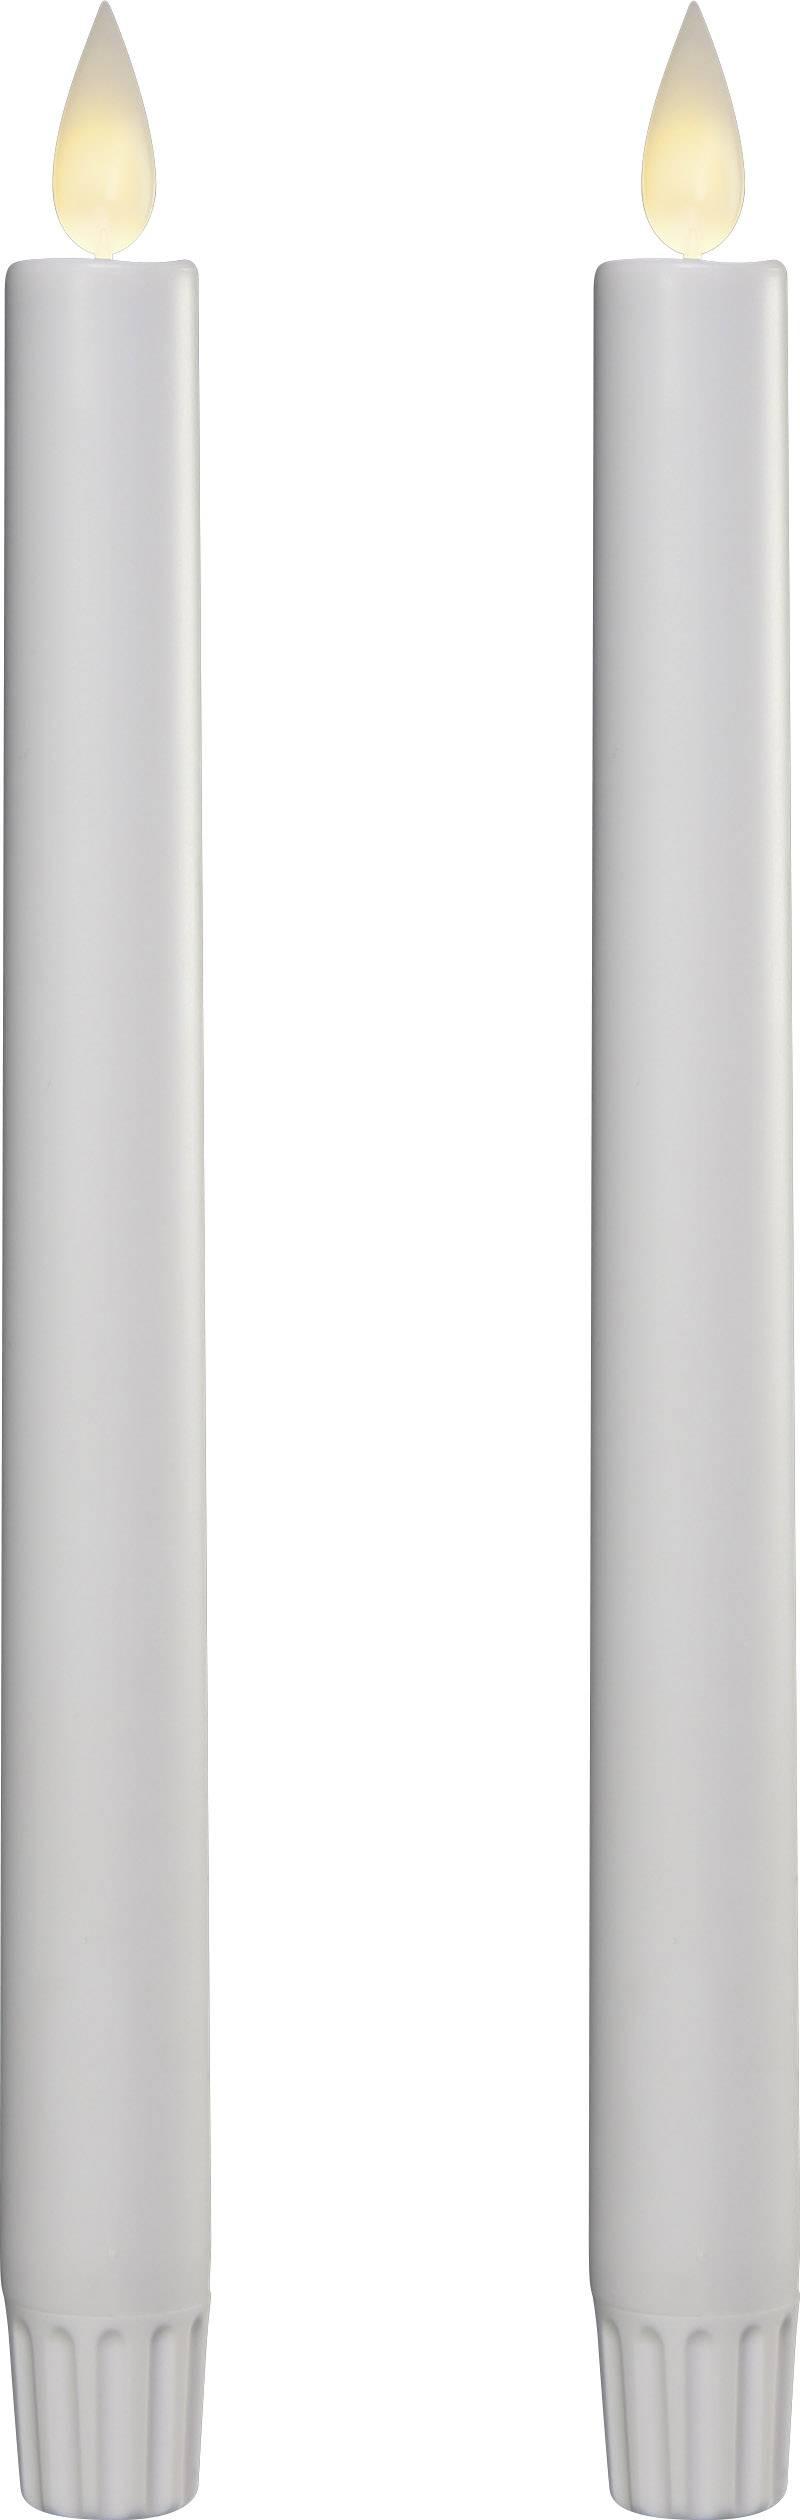 Dekorační LED svíčka do svícnu Polarlite 2 ks, bílá